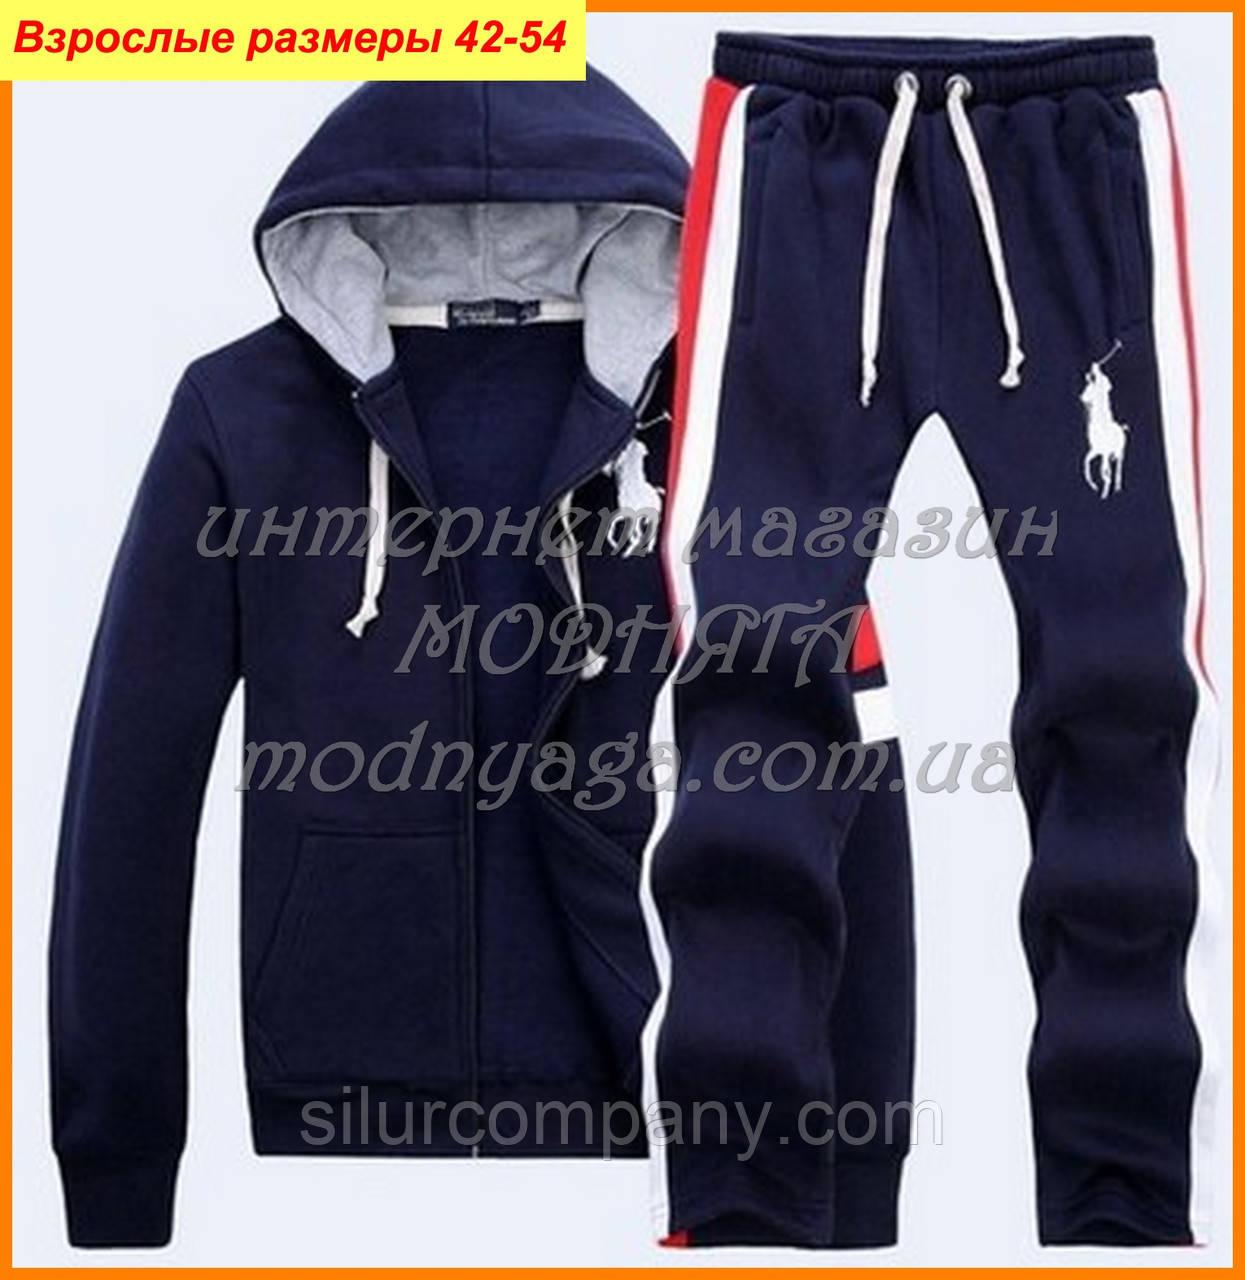 e9ab1d5e Спортивный костюм мужской недорого | костюмы Polo - Интернет магазин